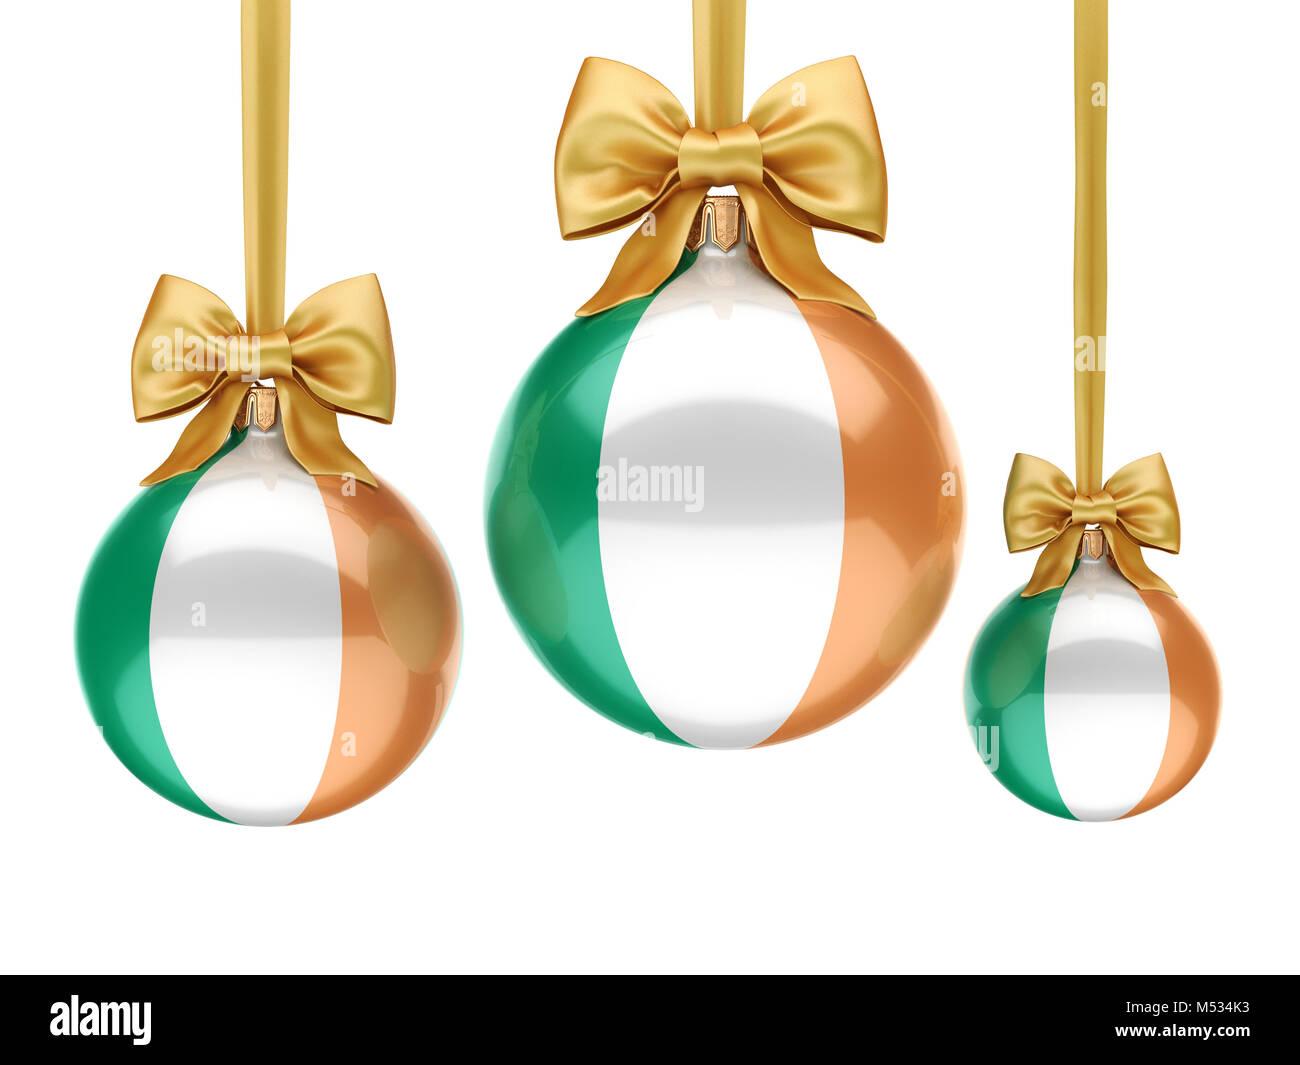 Christmas Tradition Ireland Stock Photos & Christmas Tradition ...